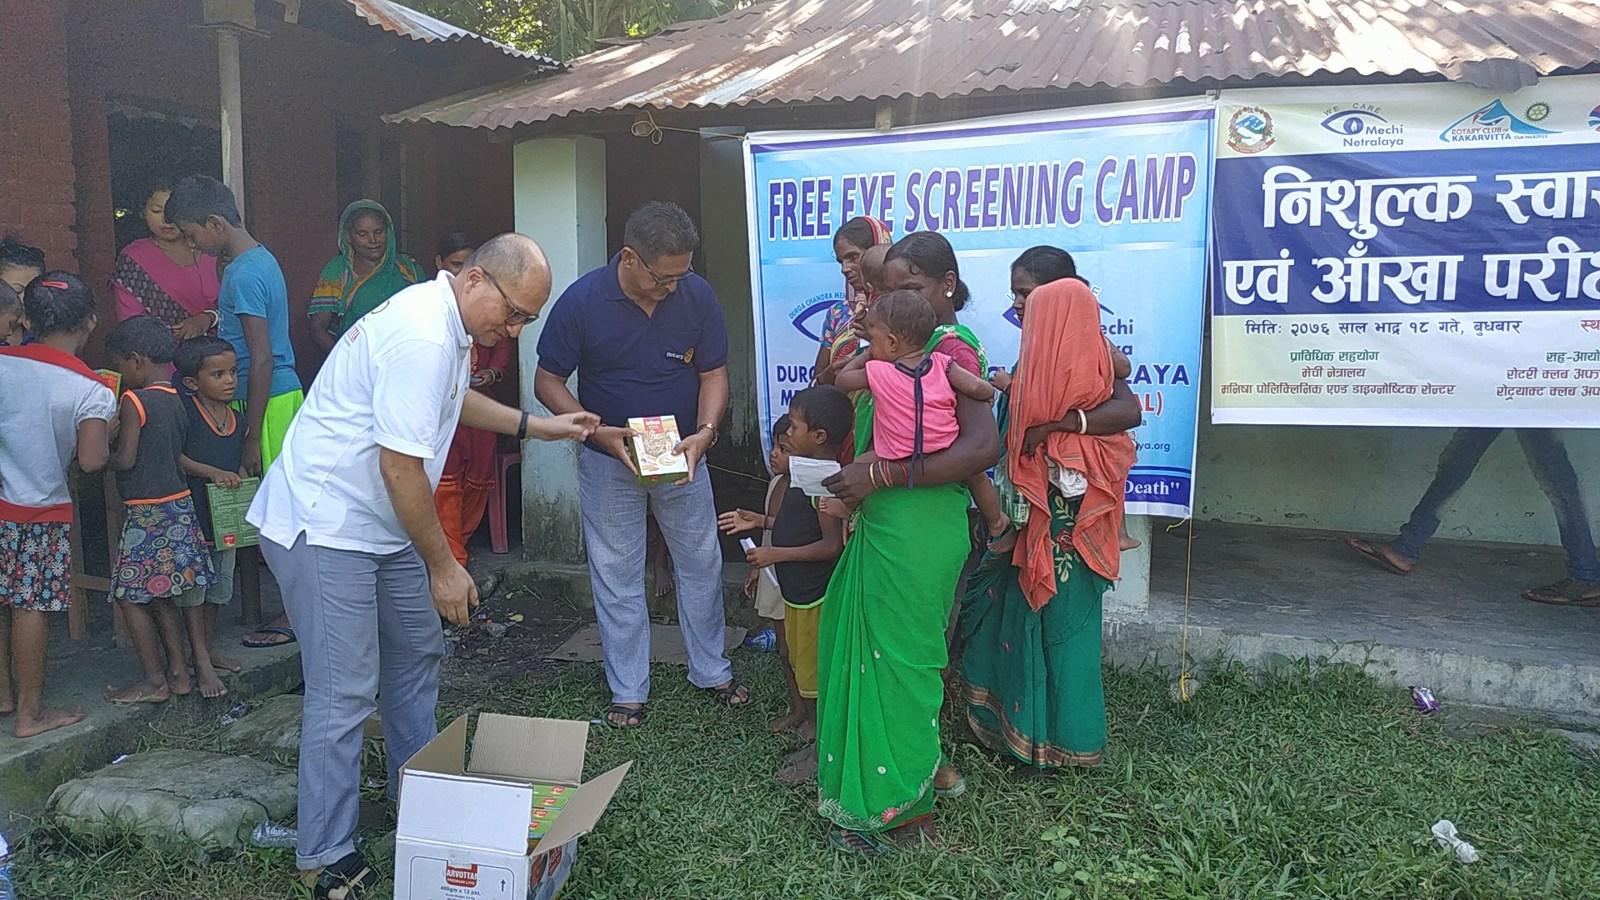 Free-Health-Camp-Eye-Screening-at-Gwala-Basti-Mechinagar-15-Jhapa-Nepal-Rotary-Club-of-Kakarvitta-42